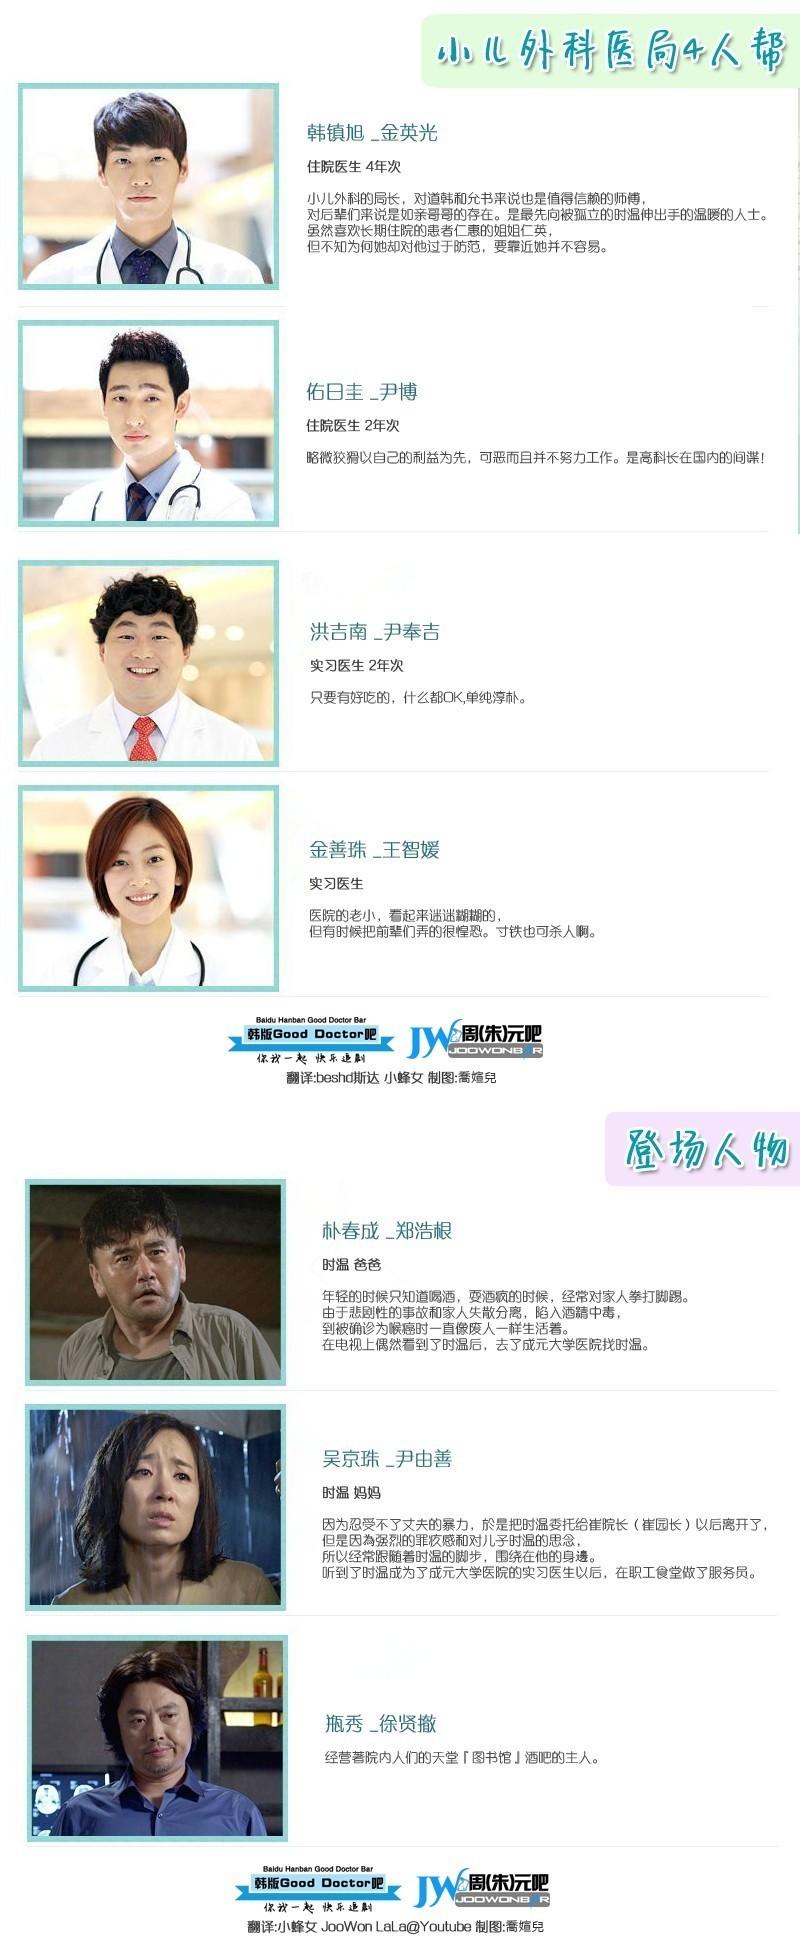 Good Doctor_人物介紹_7